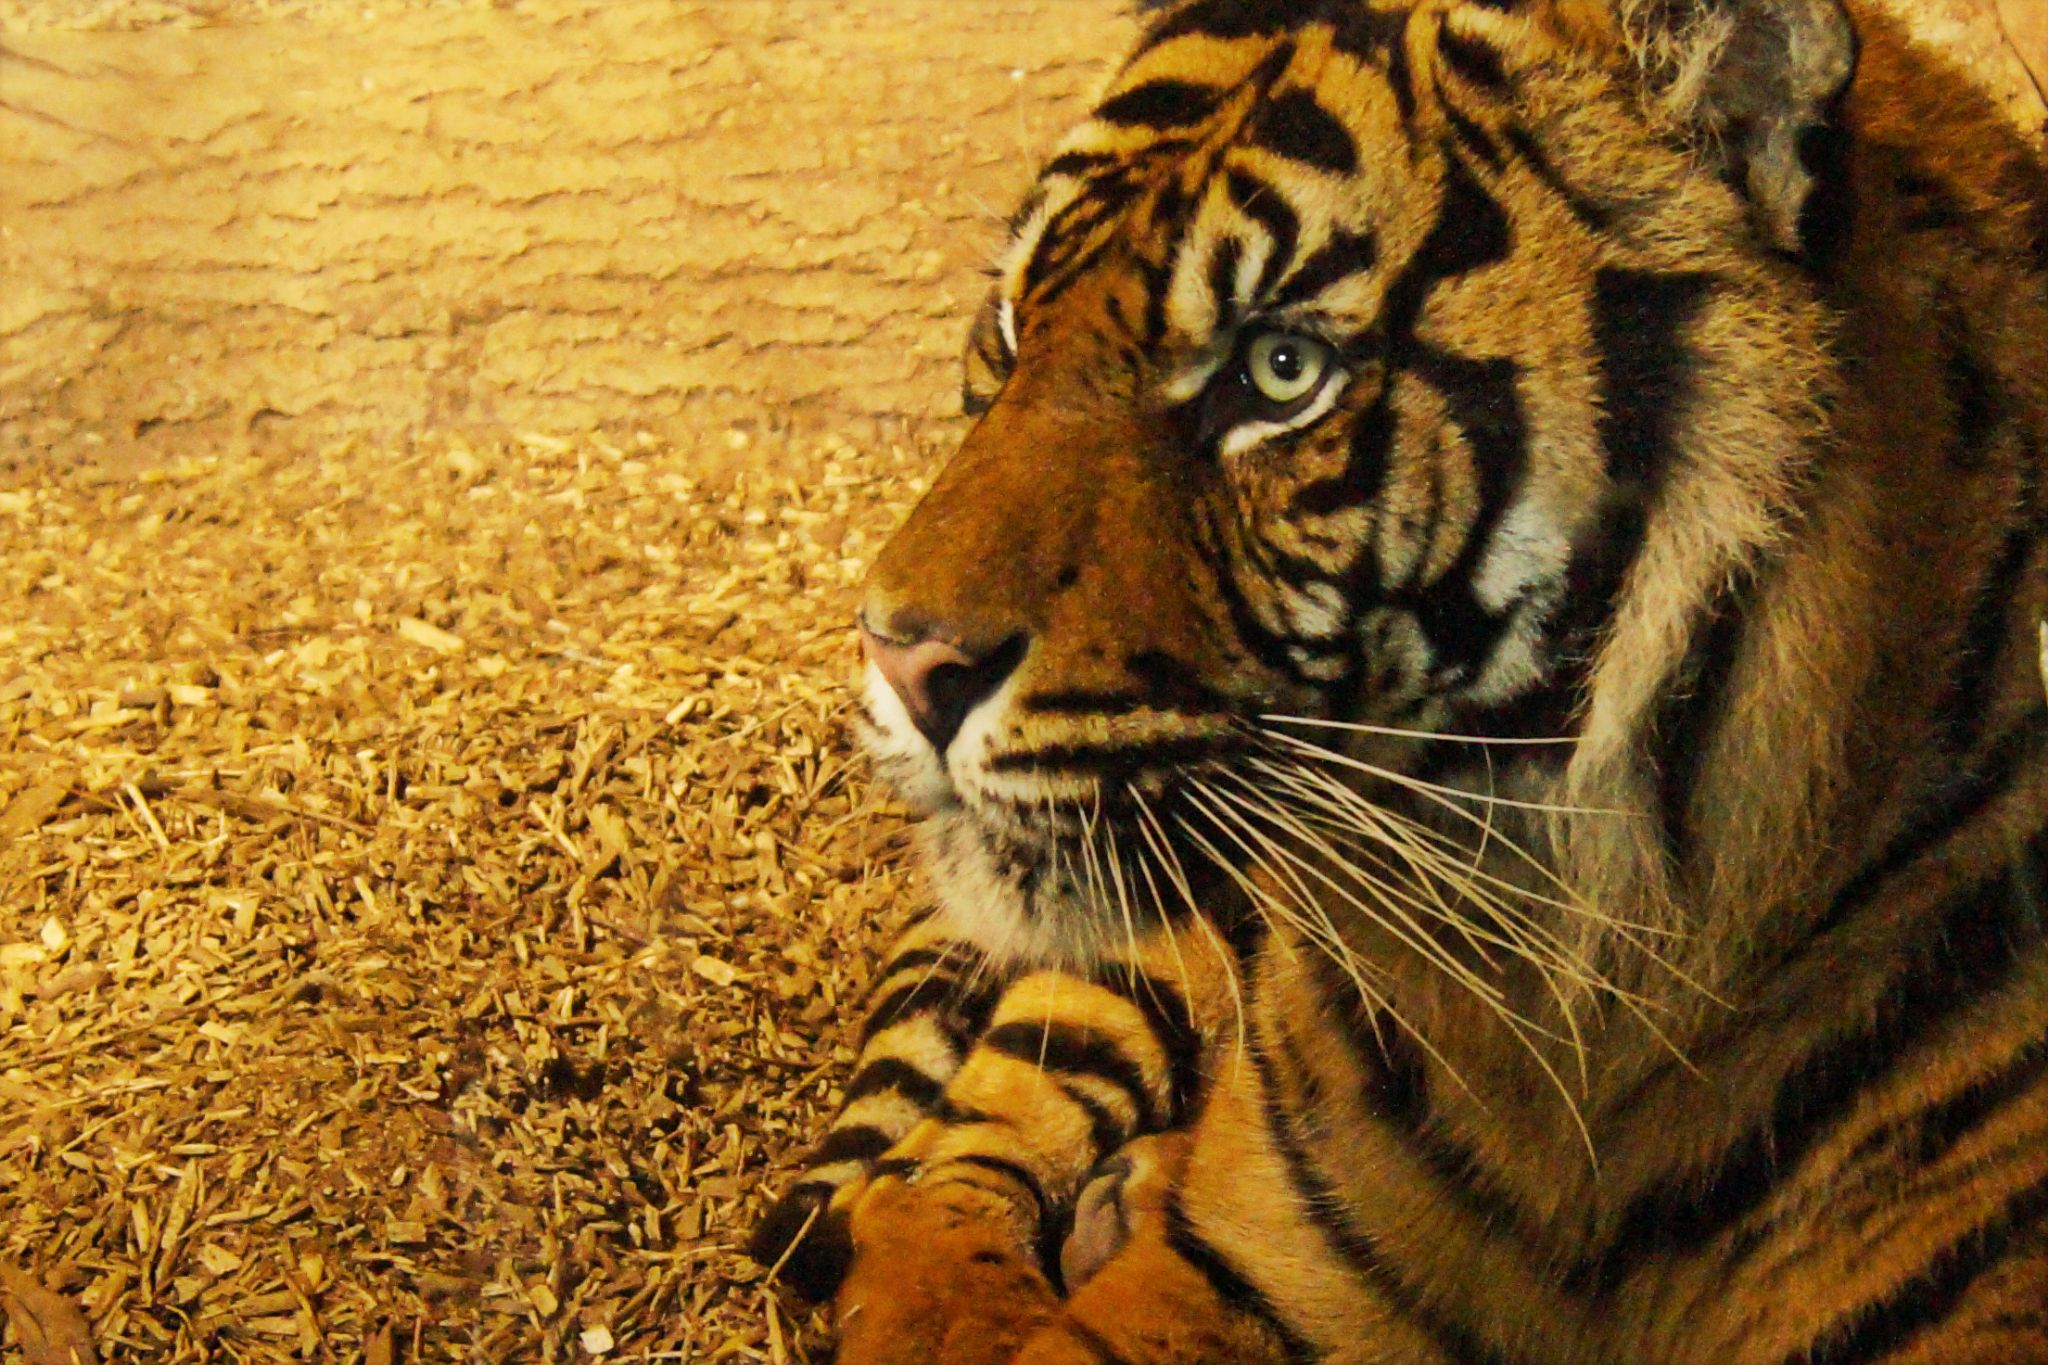 Tiger by Syeda Rosina Begum